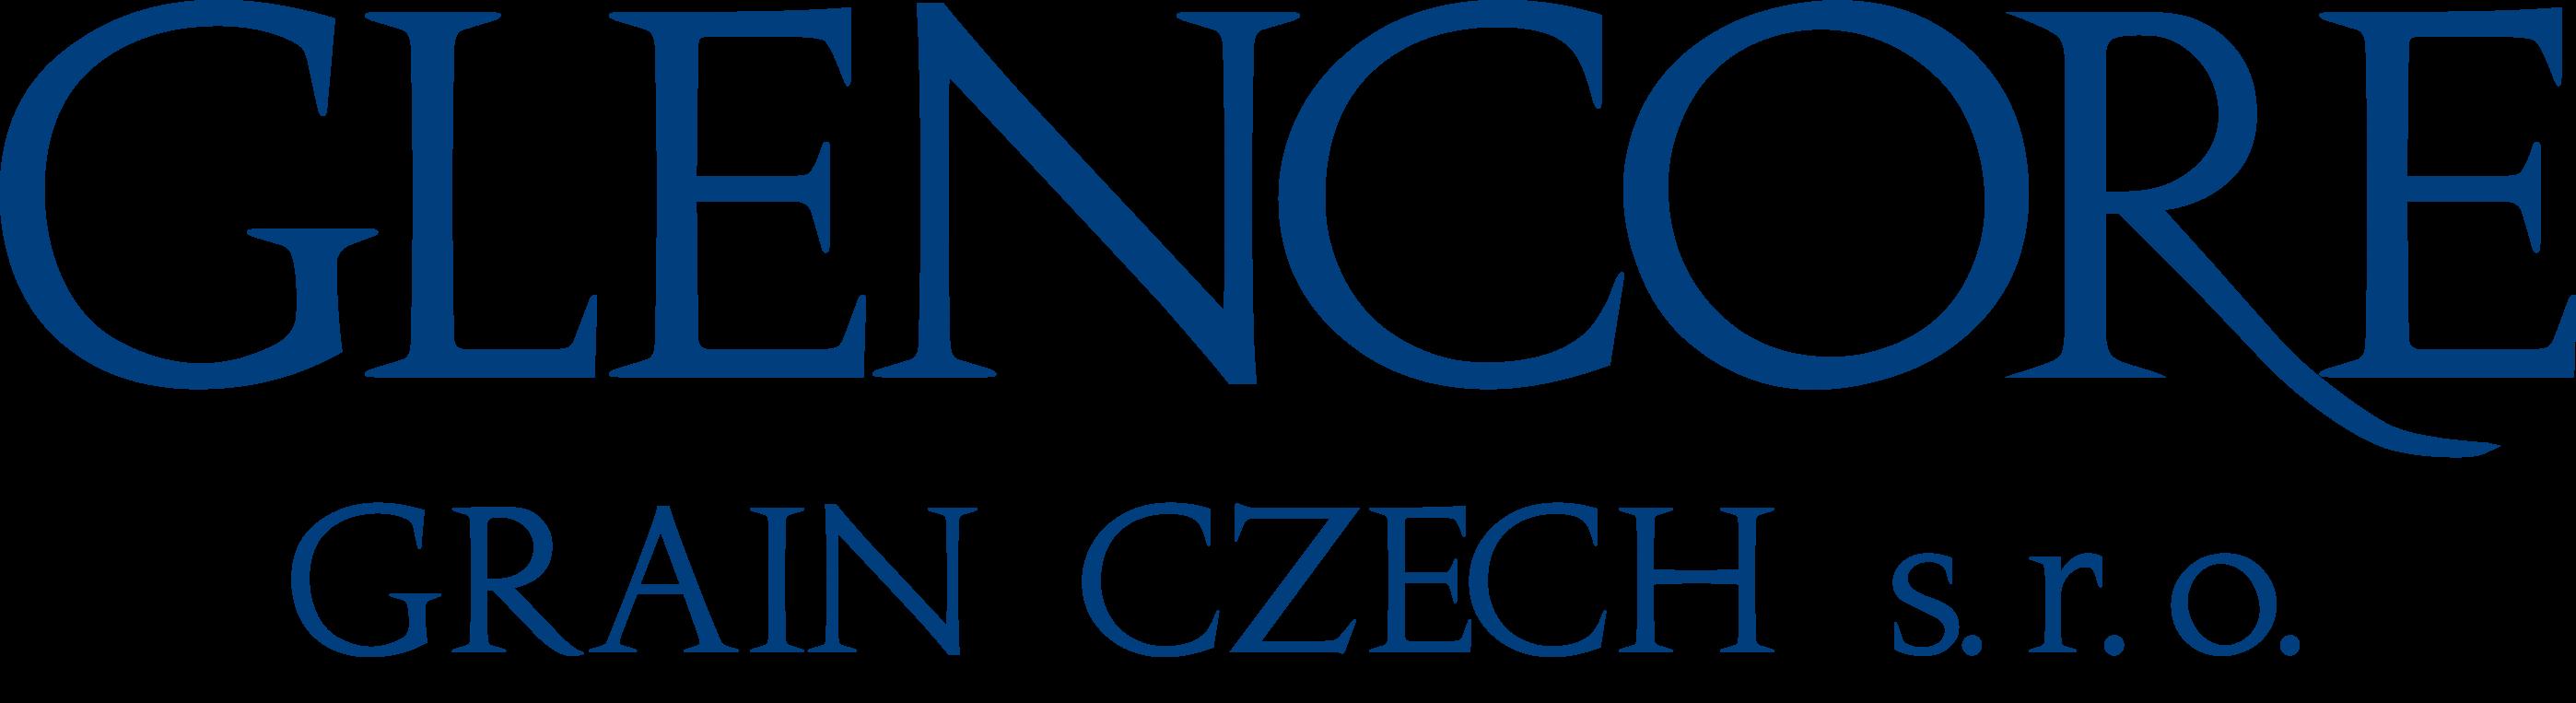 www.glencore.com - logo